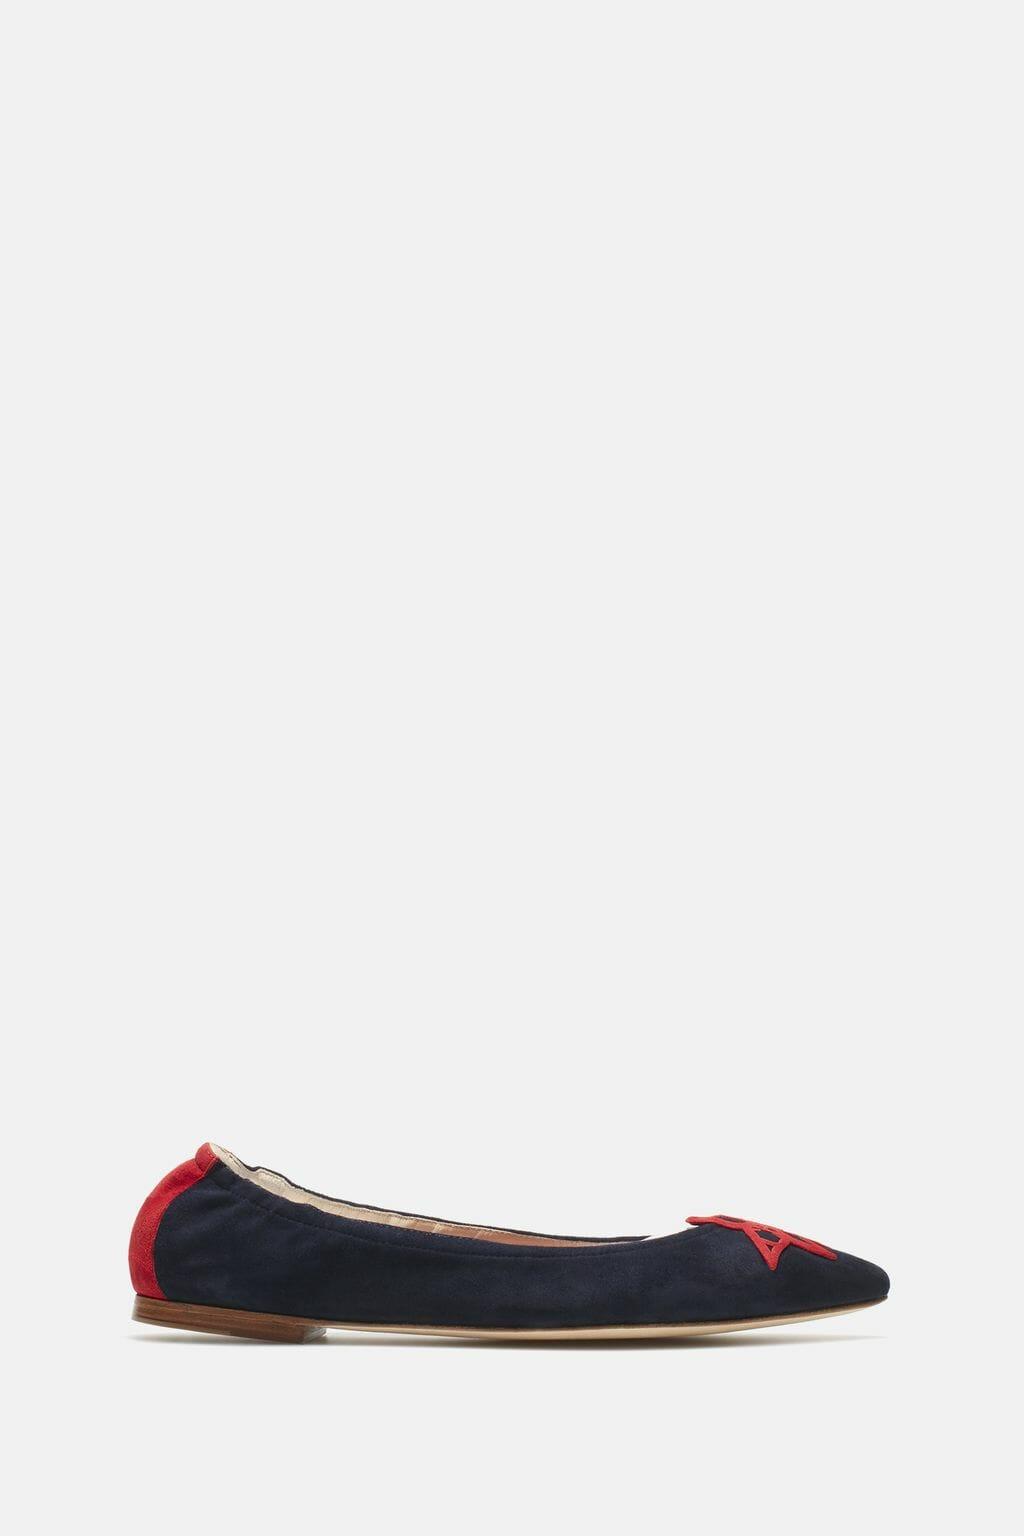 CH-Carolina-herrera-shoes-collection-Spring-Summer-2018-shoe-73